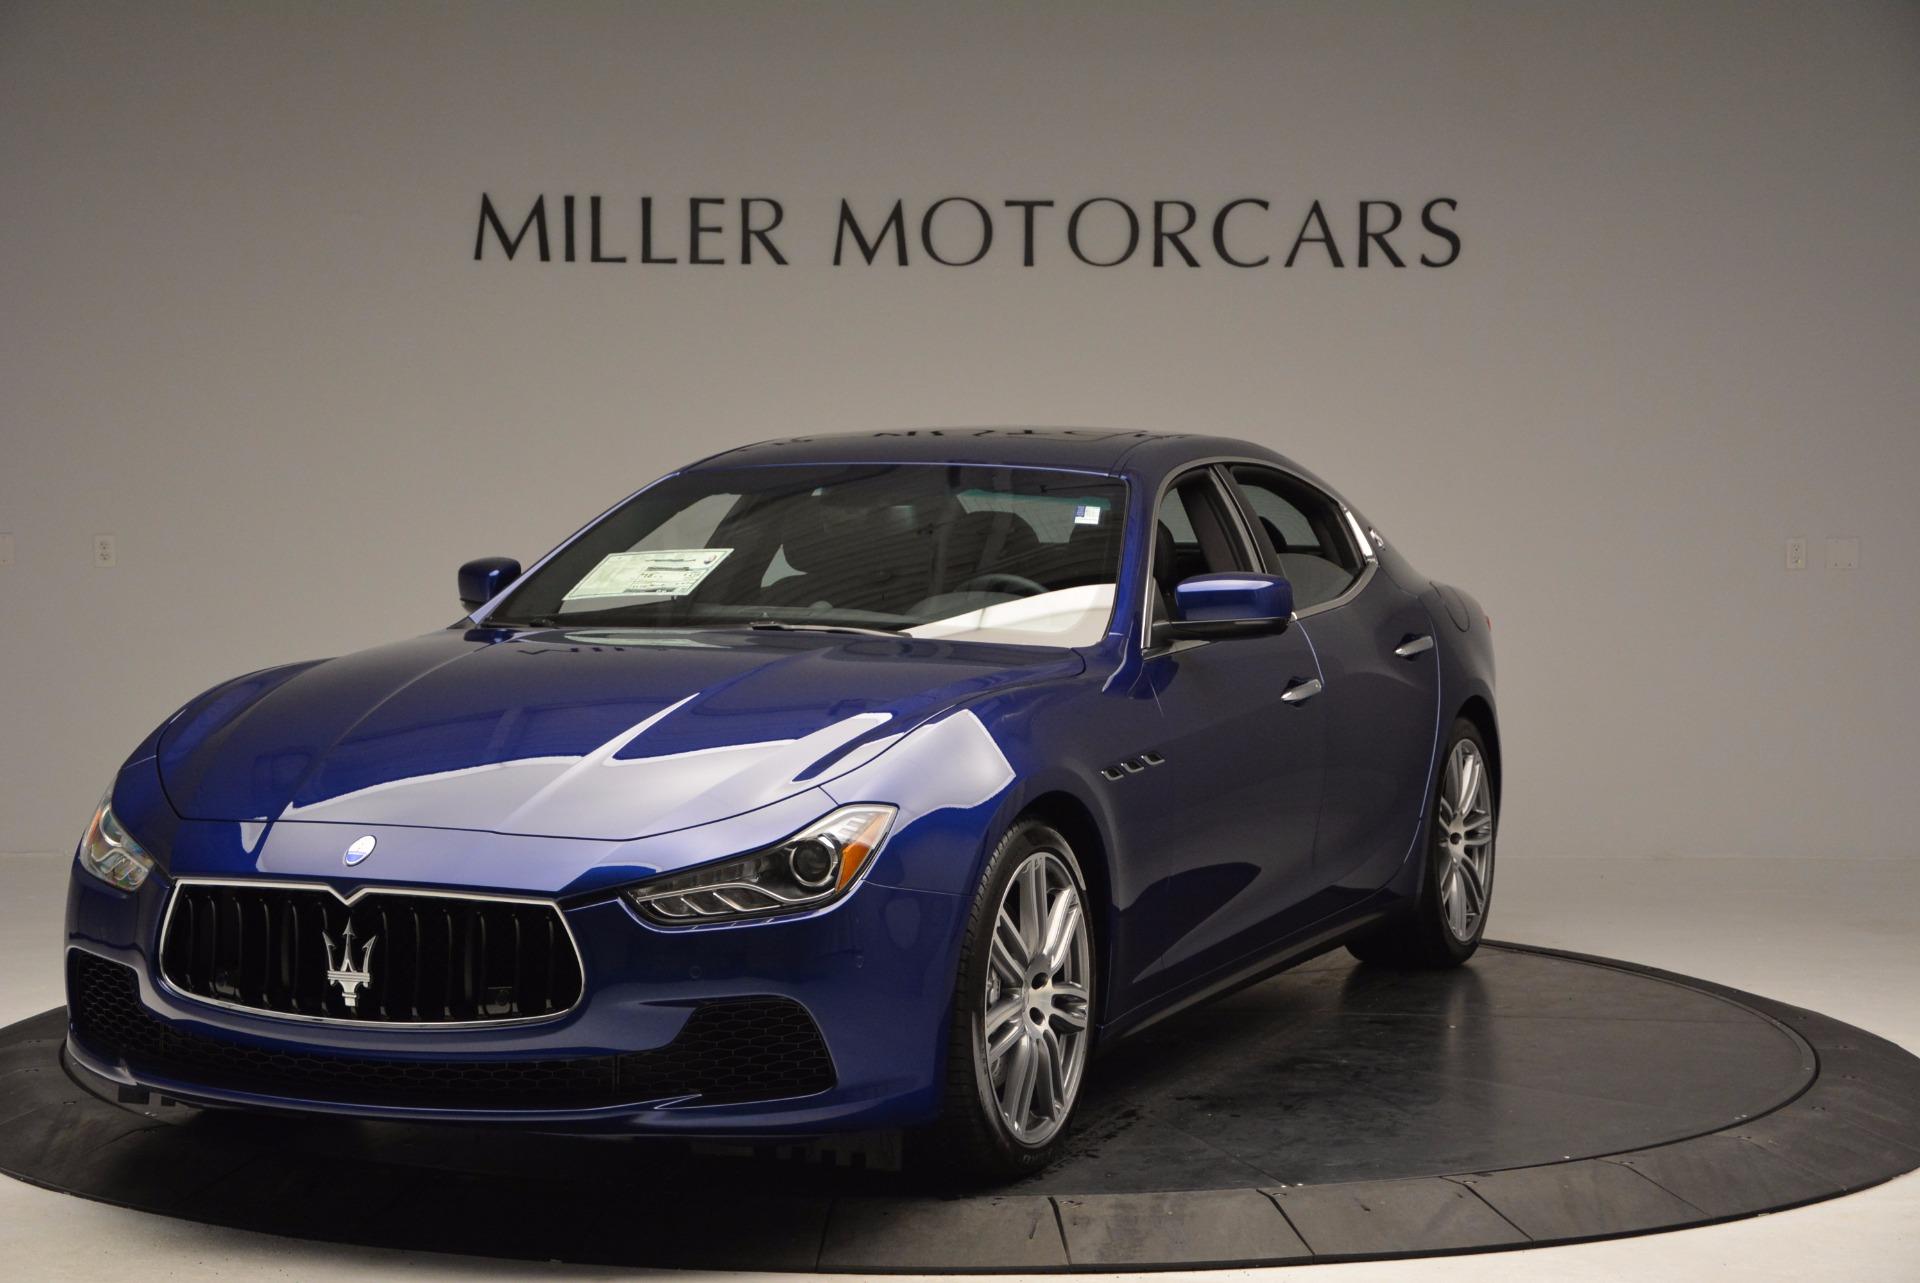 New 2017 Maserati Ghibli S Q4 For Sale () | Miller Motorcars Stock #M1828